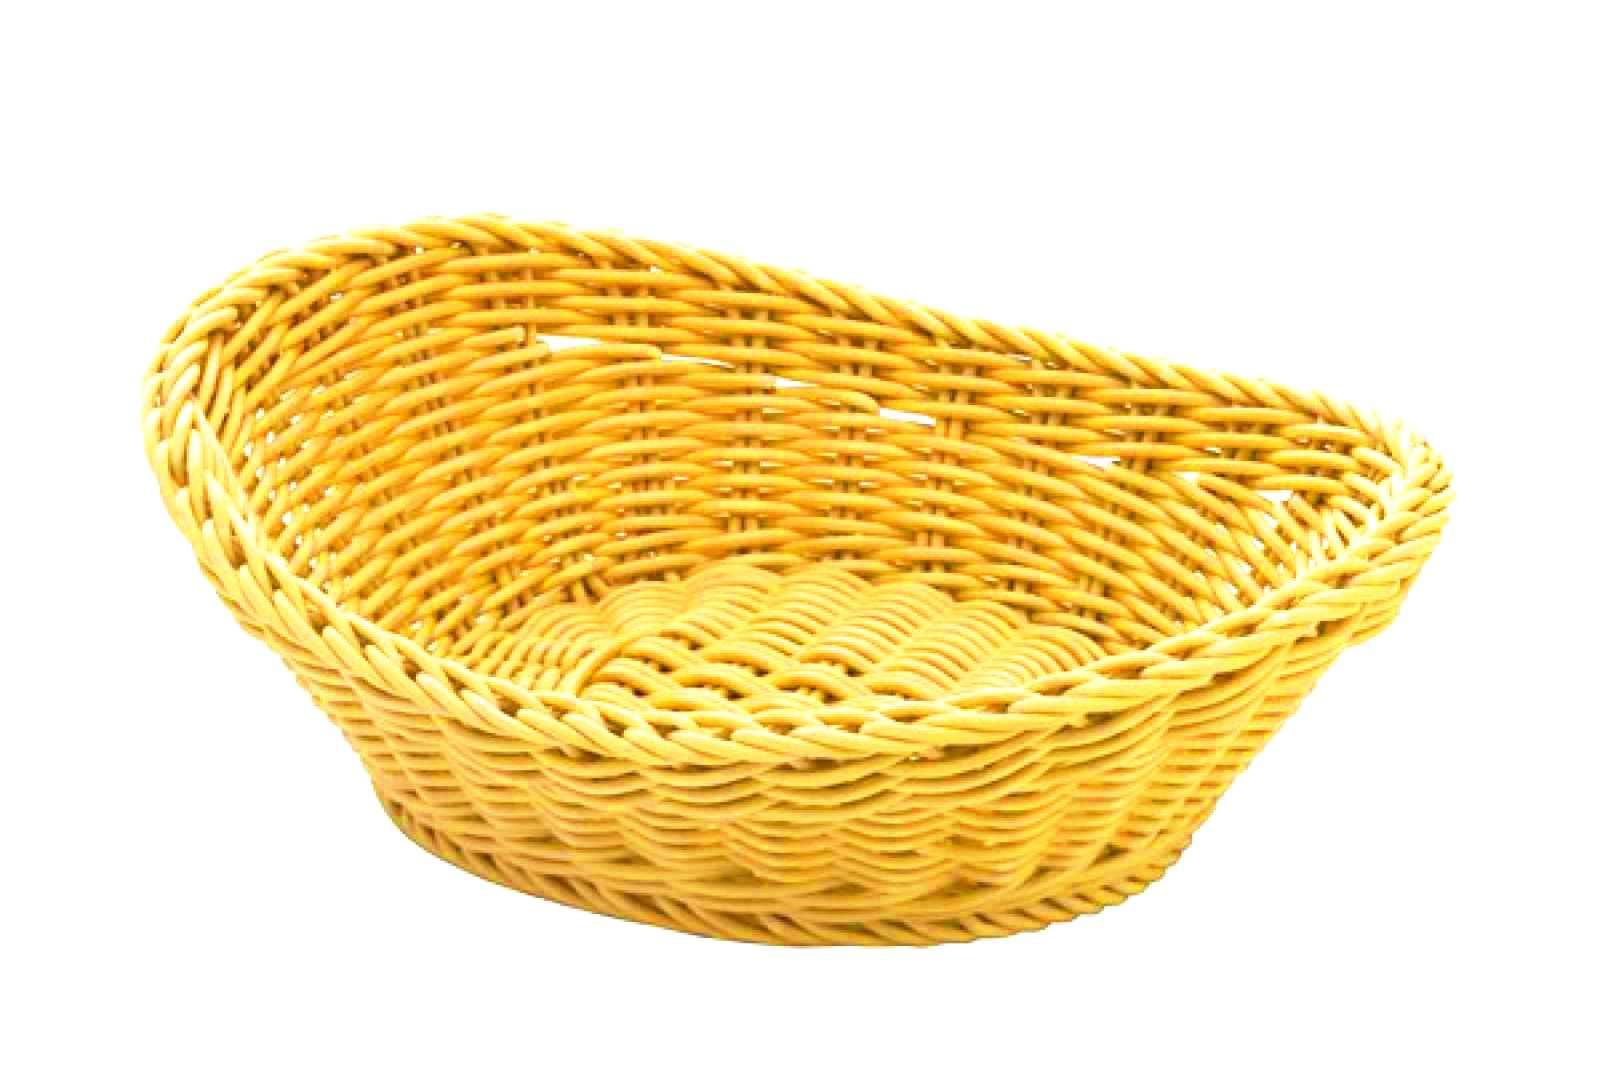 Онлайн каталог PROMENU: Корзина овальная Saleen BASKETS IN TREND COLOURS, 23,5х18х8 см, желтый Saleen 020961 471